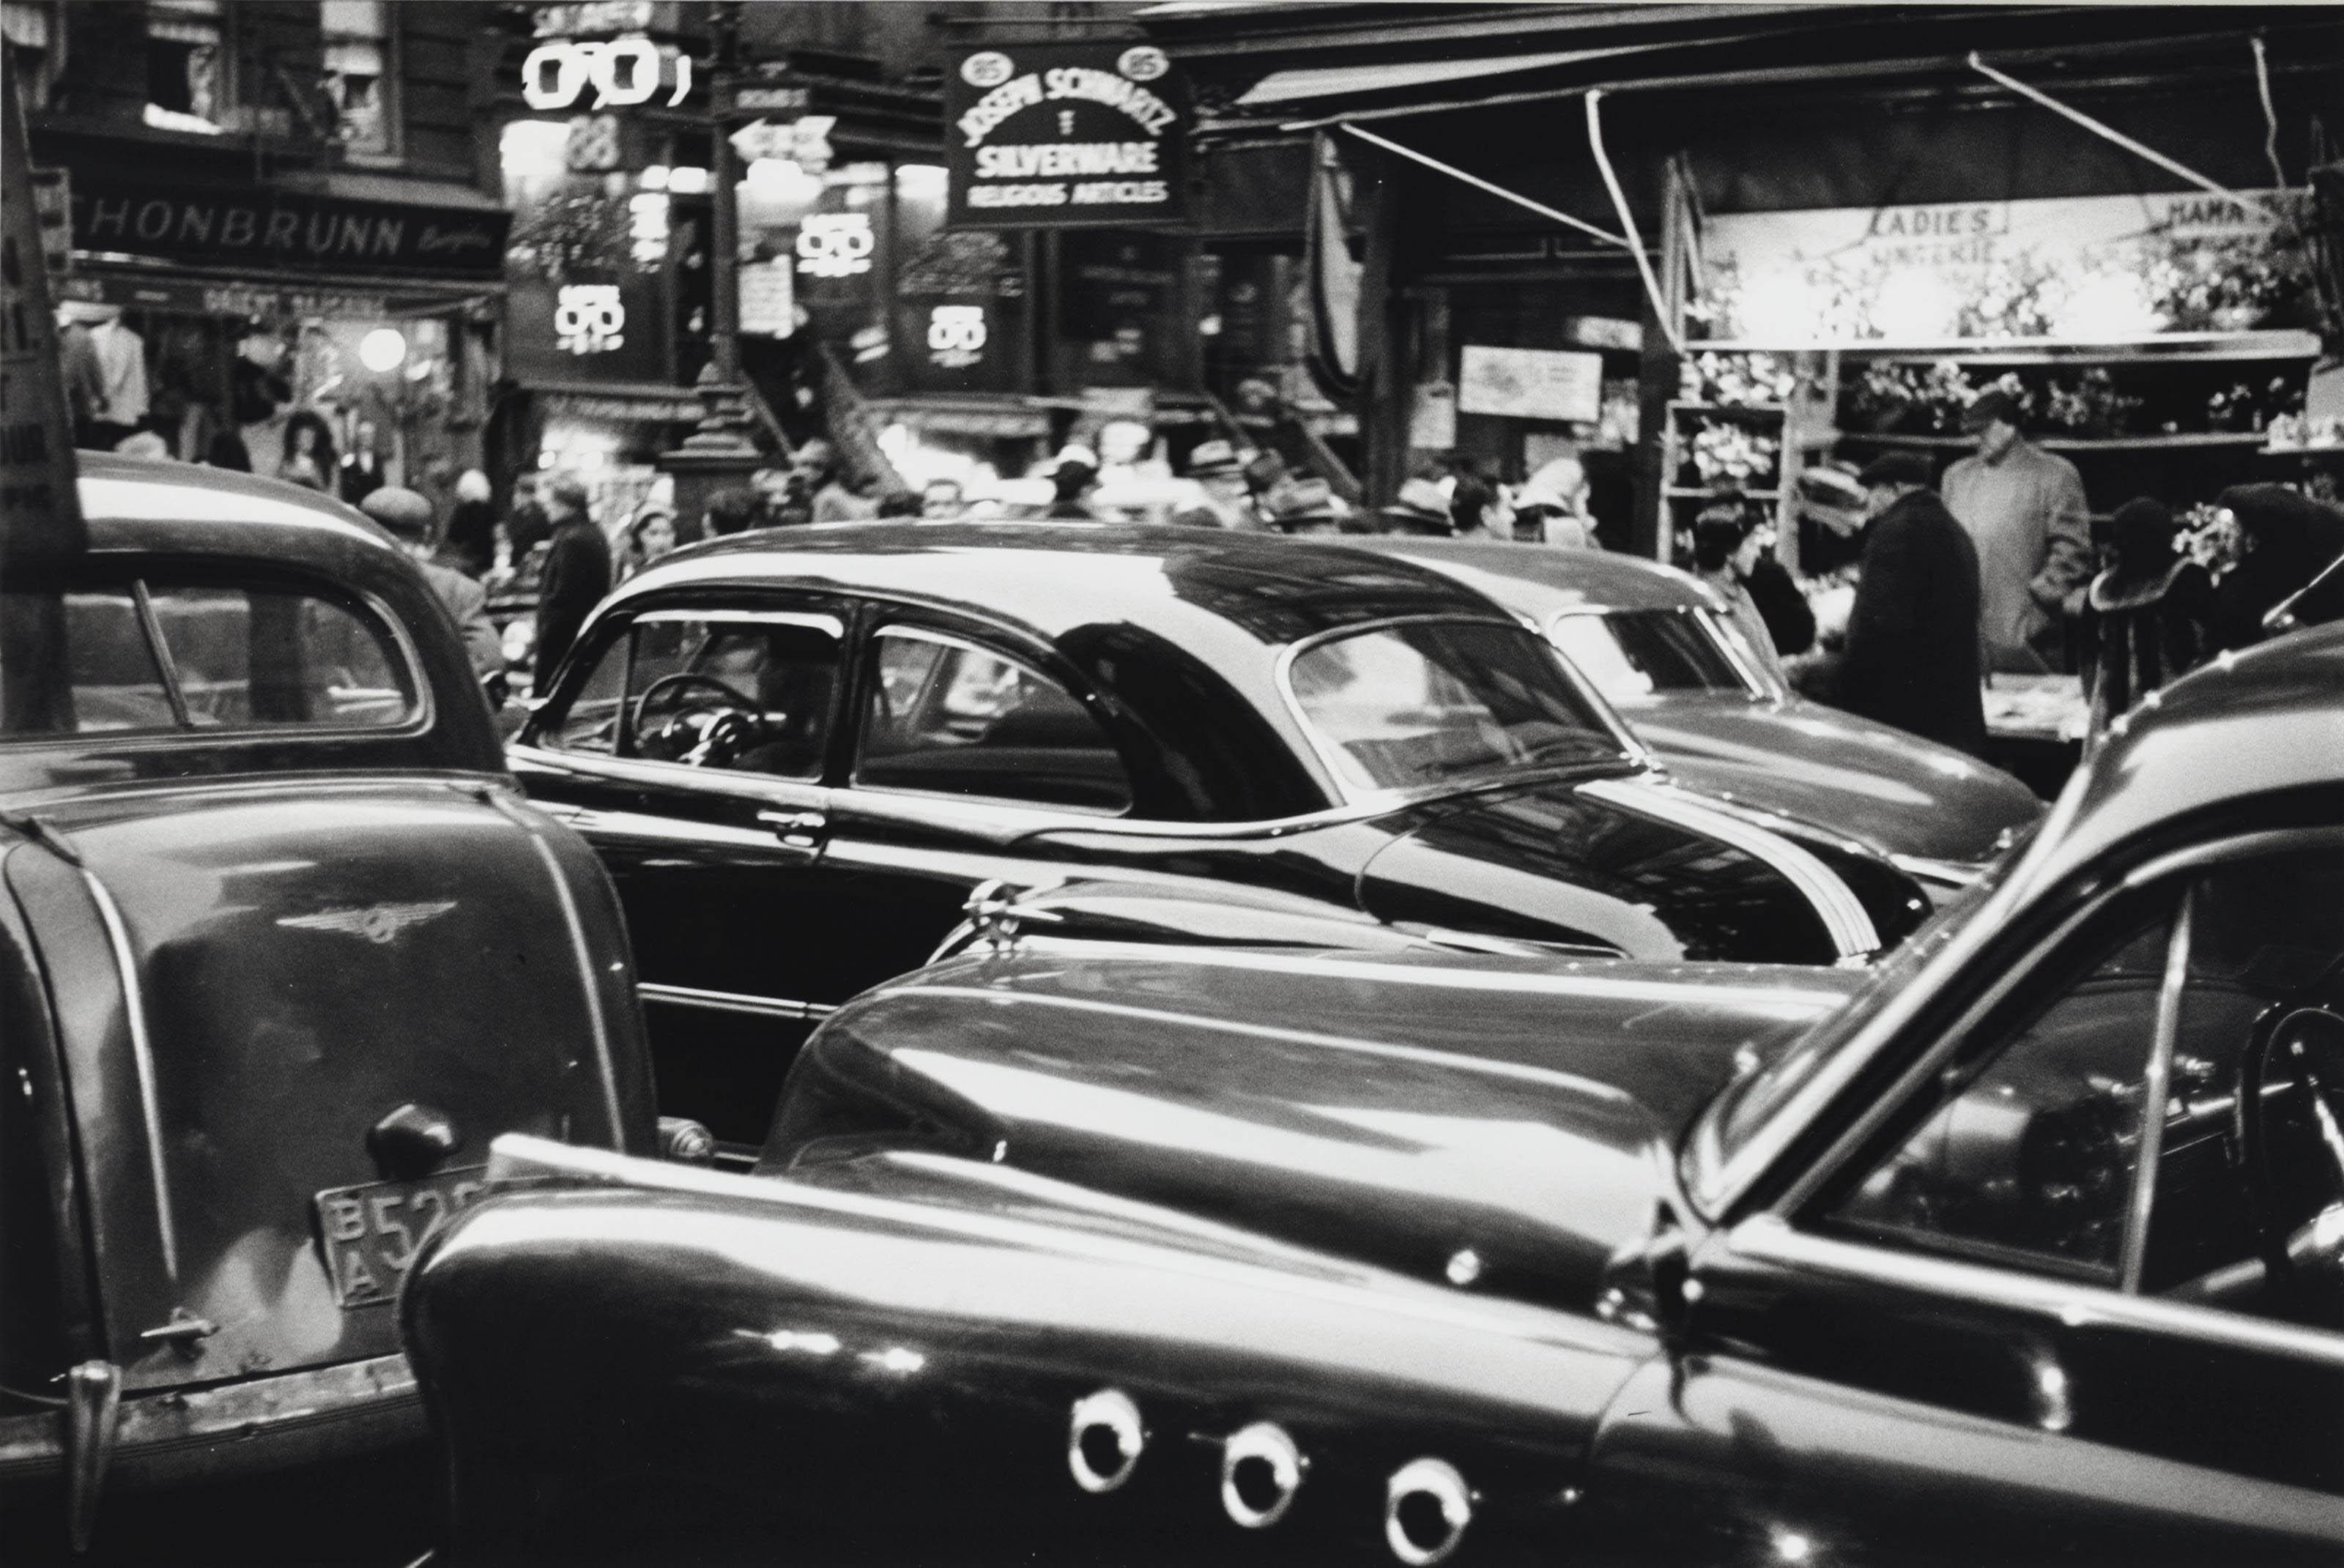 Orchard Street, N.Y.C., c. 1948